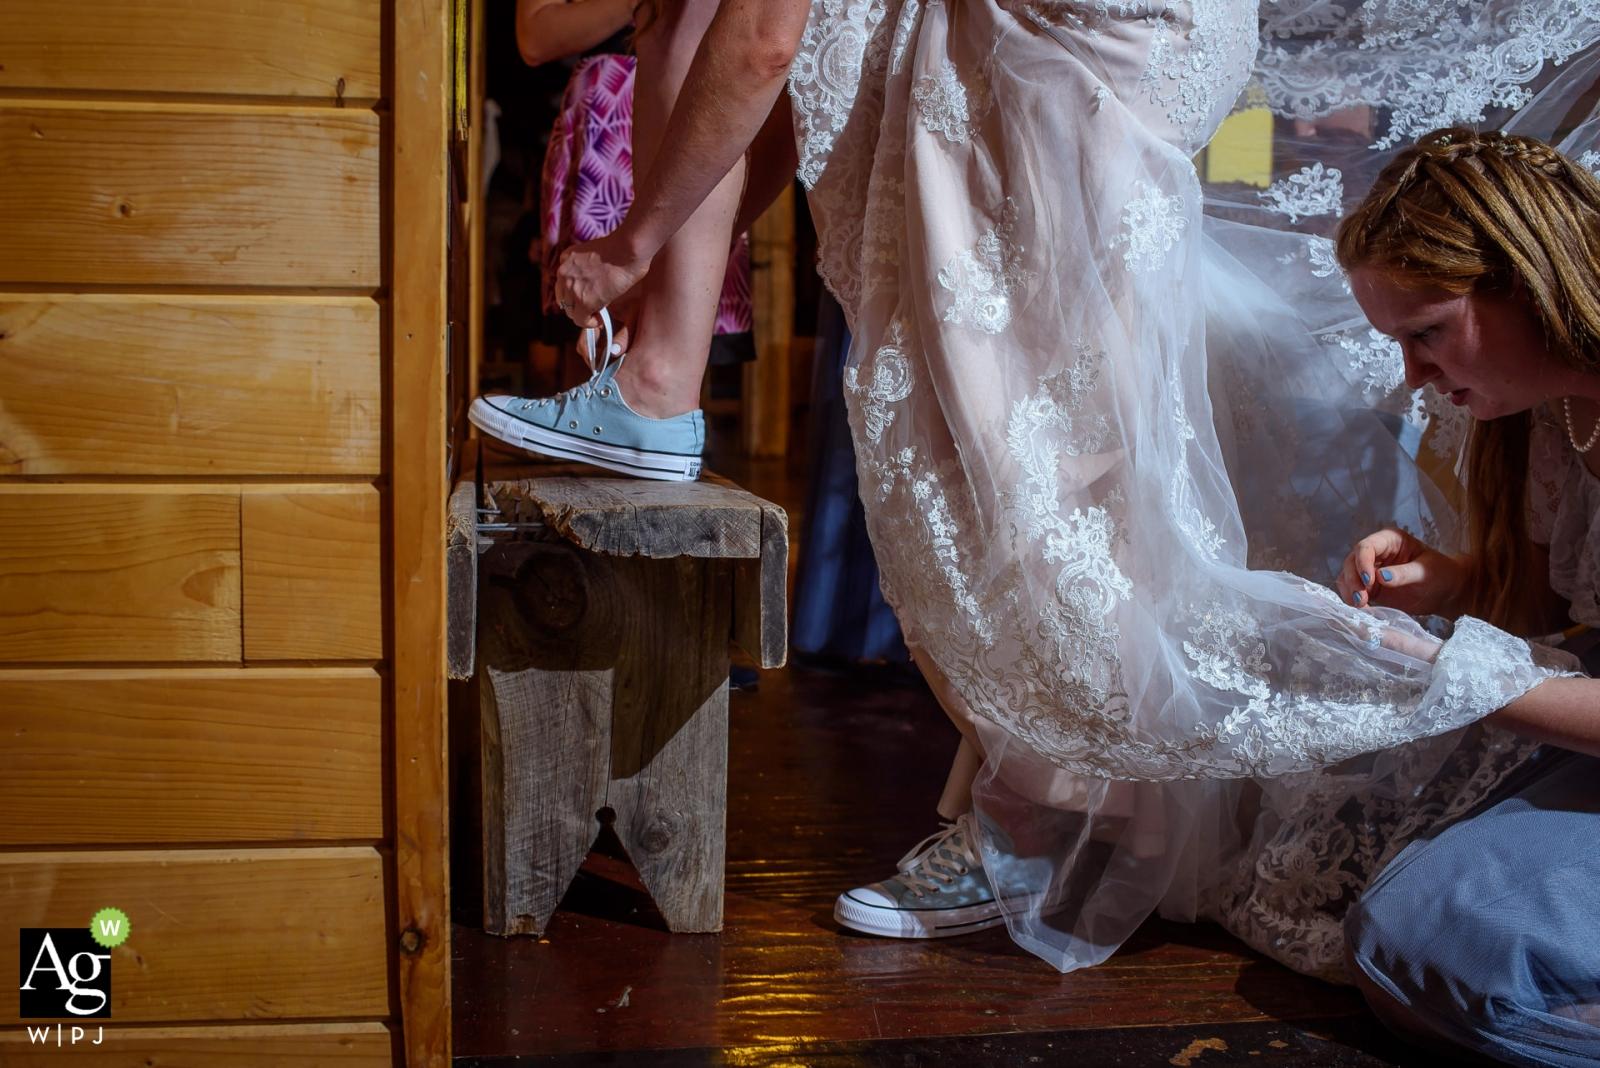 Janine Cooper is an artistic wedding photographer for Nebraska